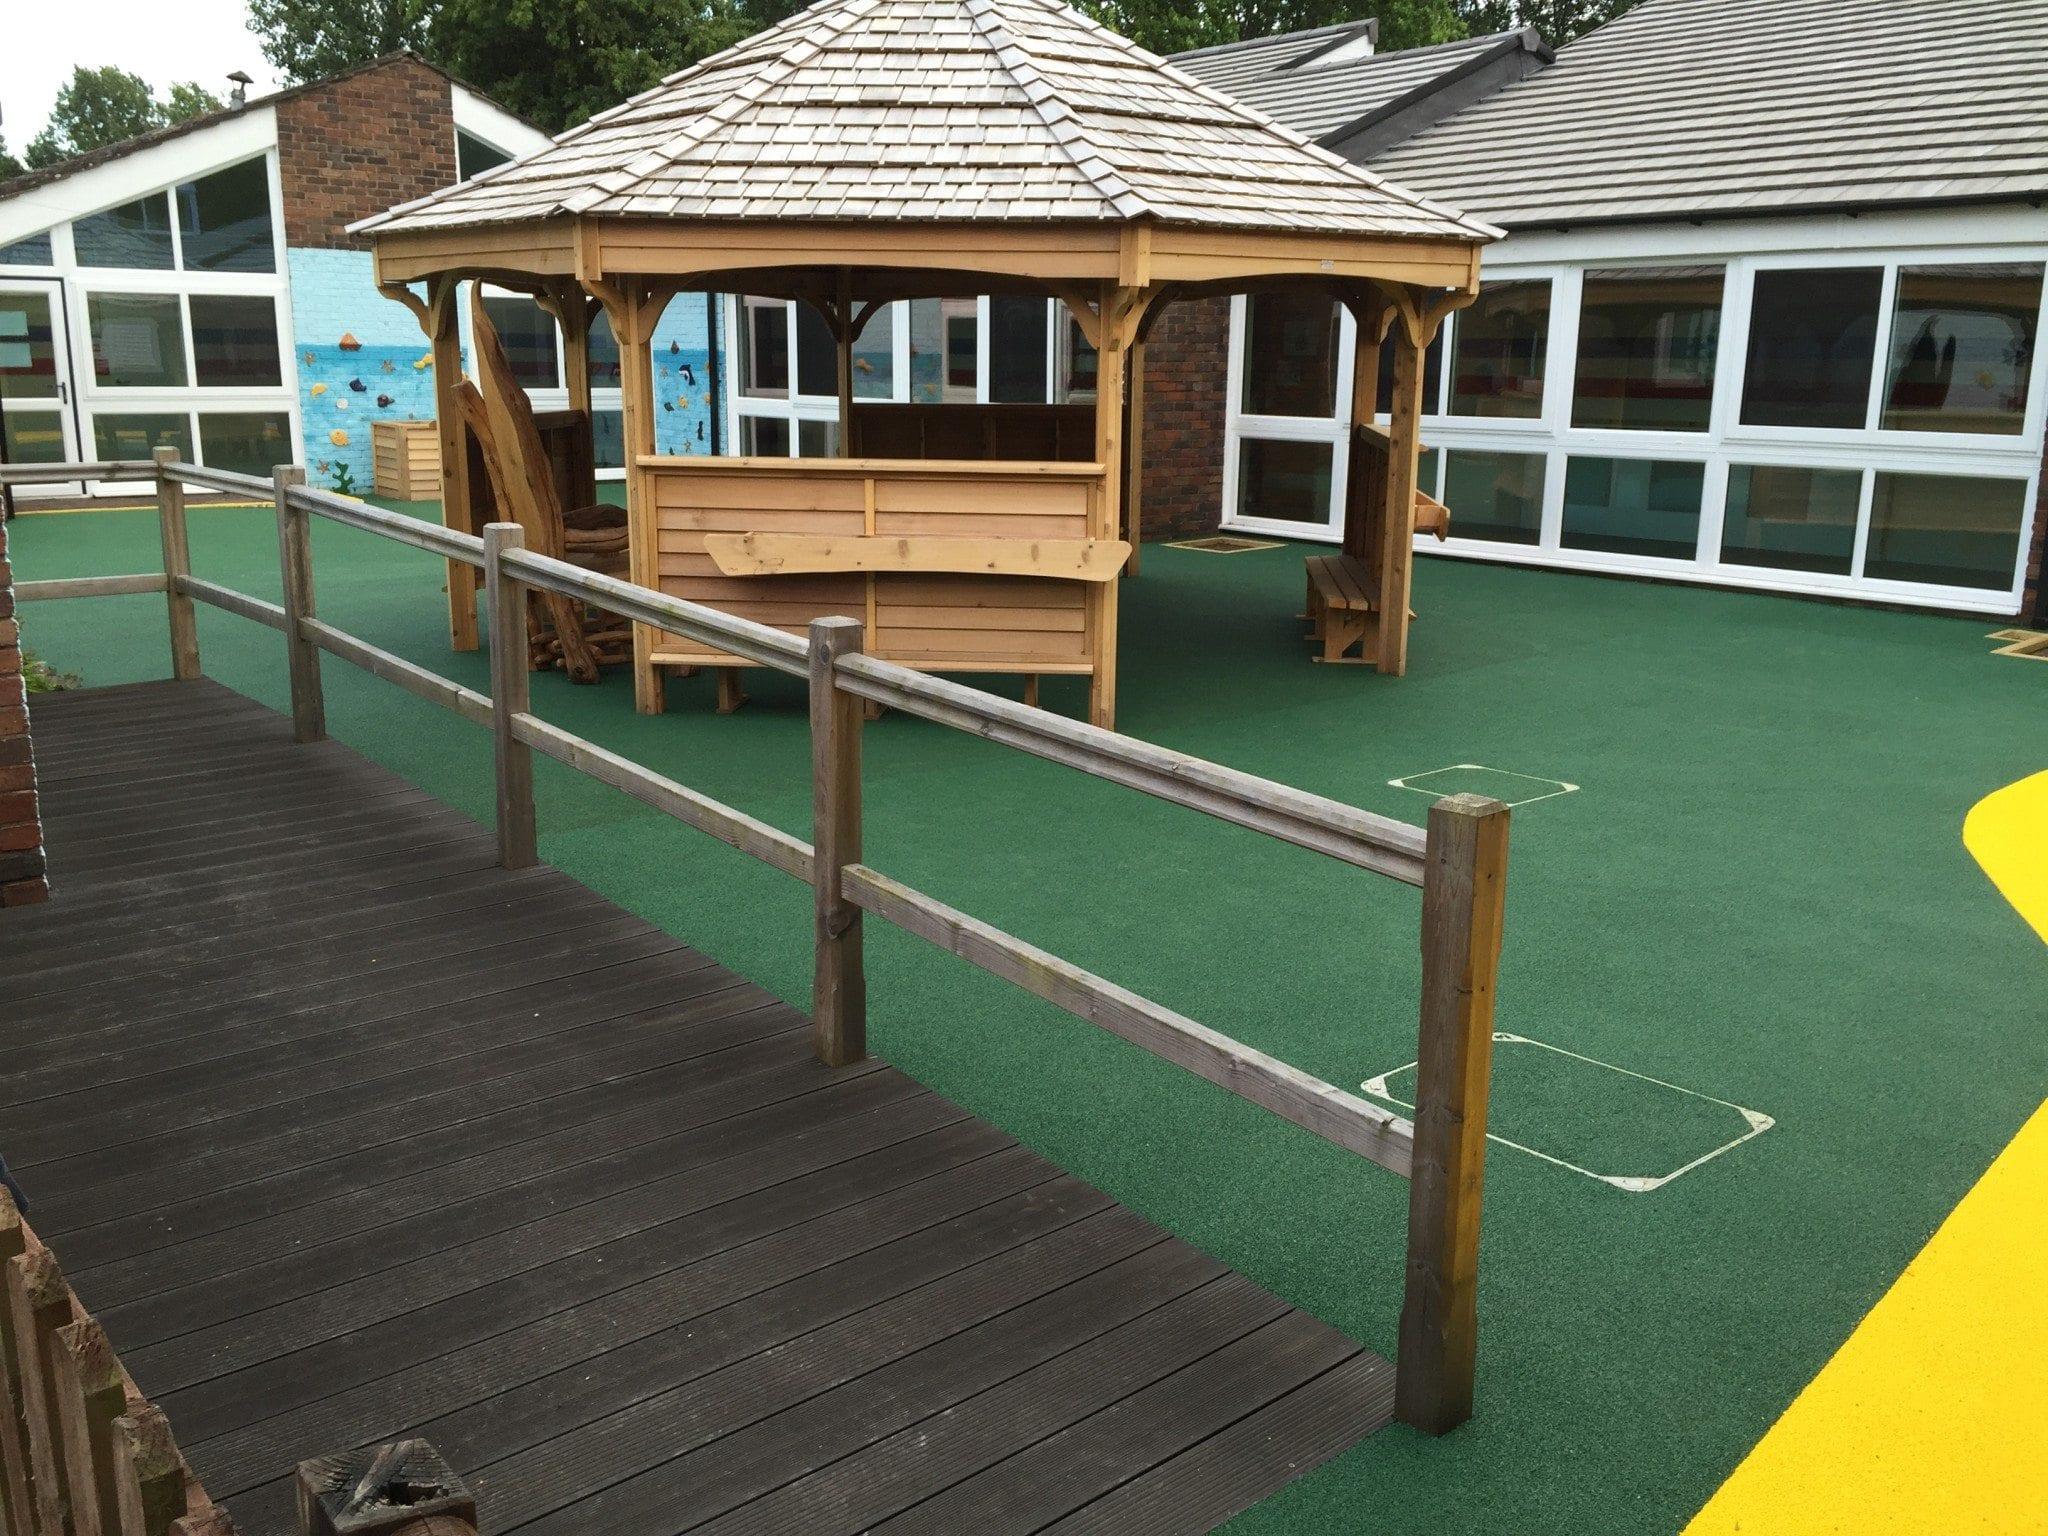 Playground Equipment for Schools - WESC